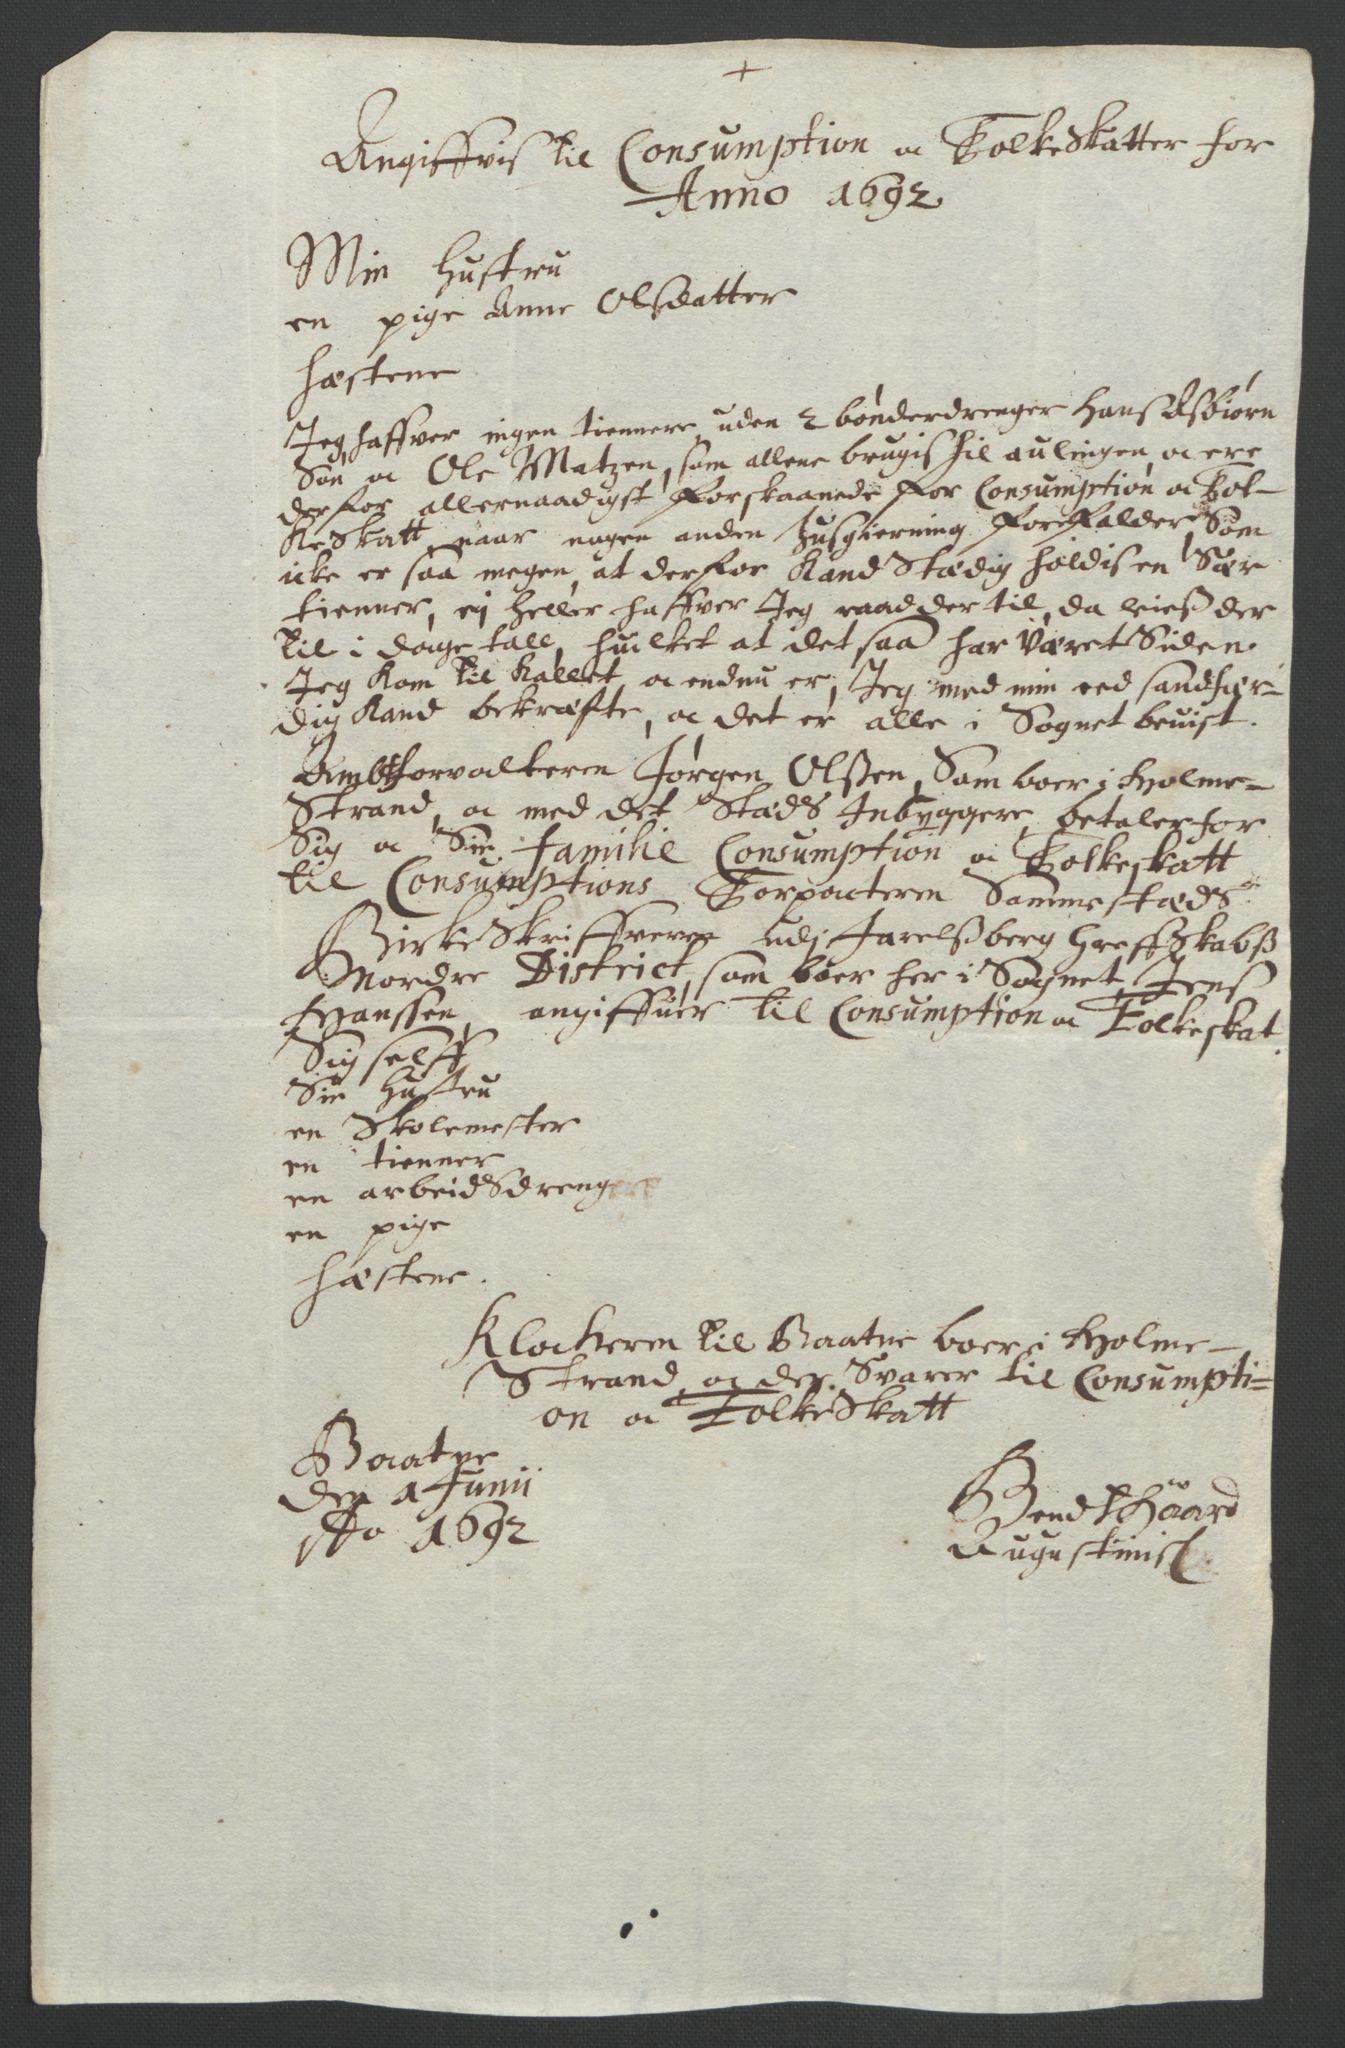 RA, Rentekammeret inntil 1814, Reviderte regnskaper, Fogderegnskap, R32/L1865: Fogderegnskap Jarlsberg grevskap, 1692, s. 259